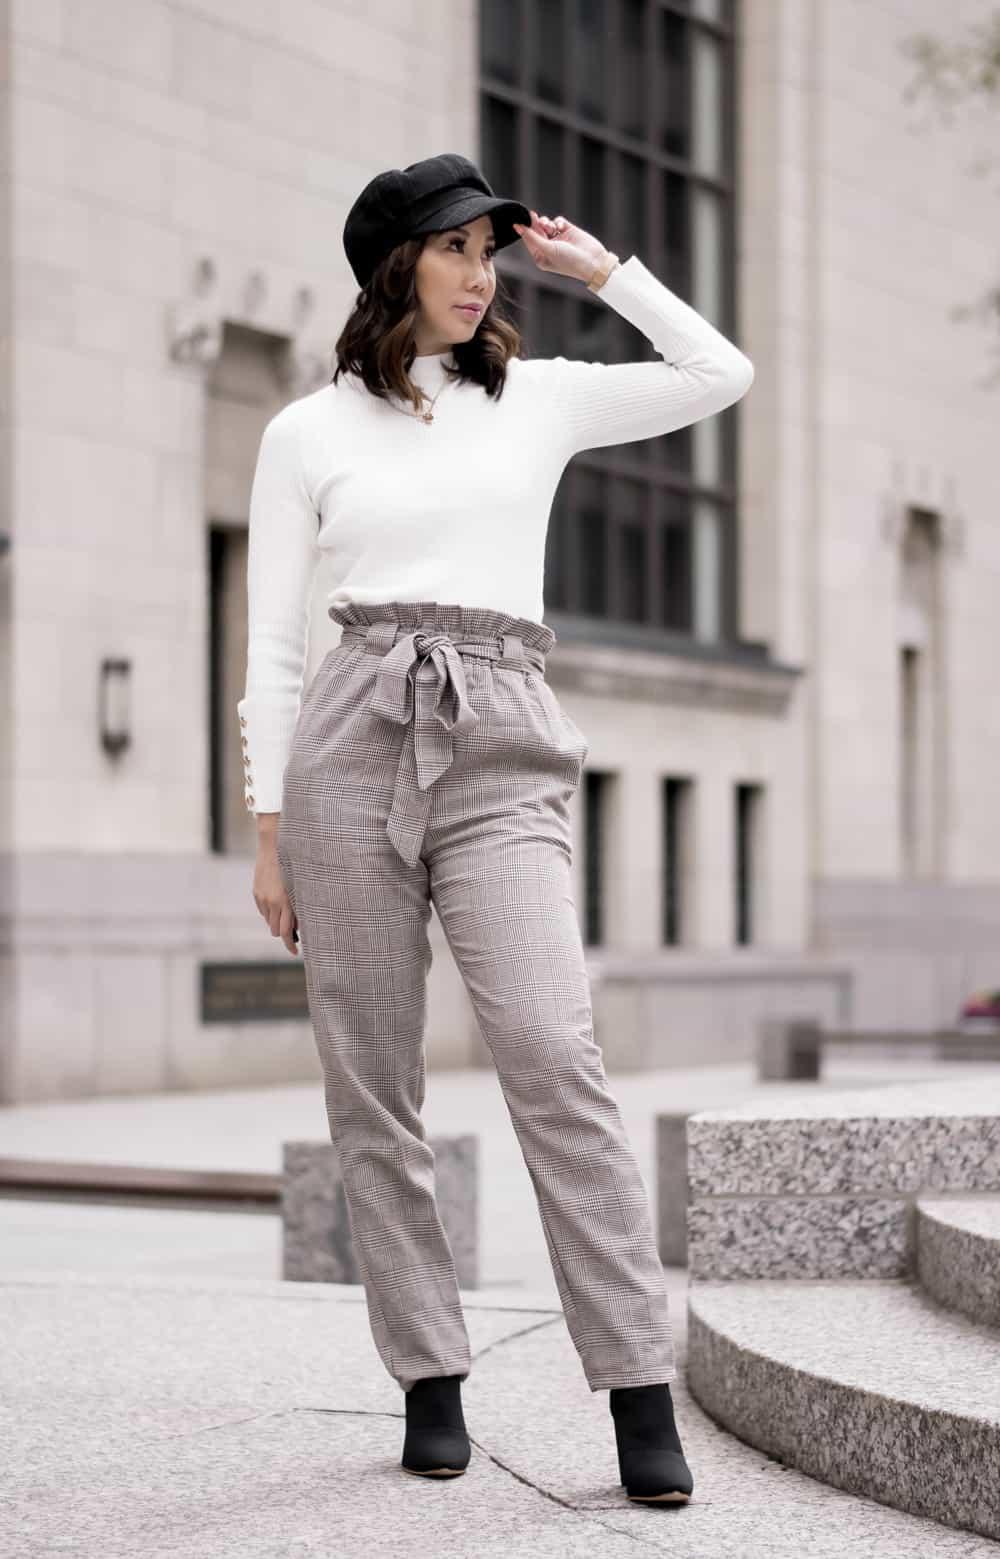 Winter OOTD: newsboy cap, drawstring plaid pants, white sweater. Fashion blogger Yesmissy